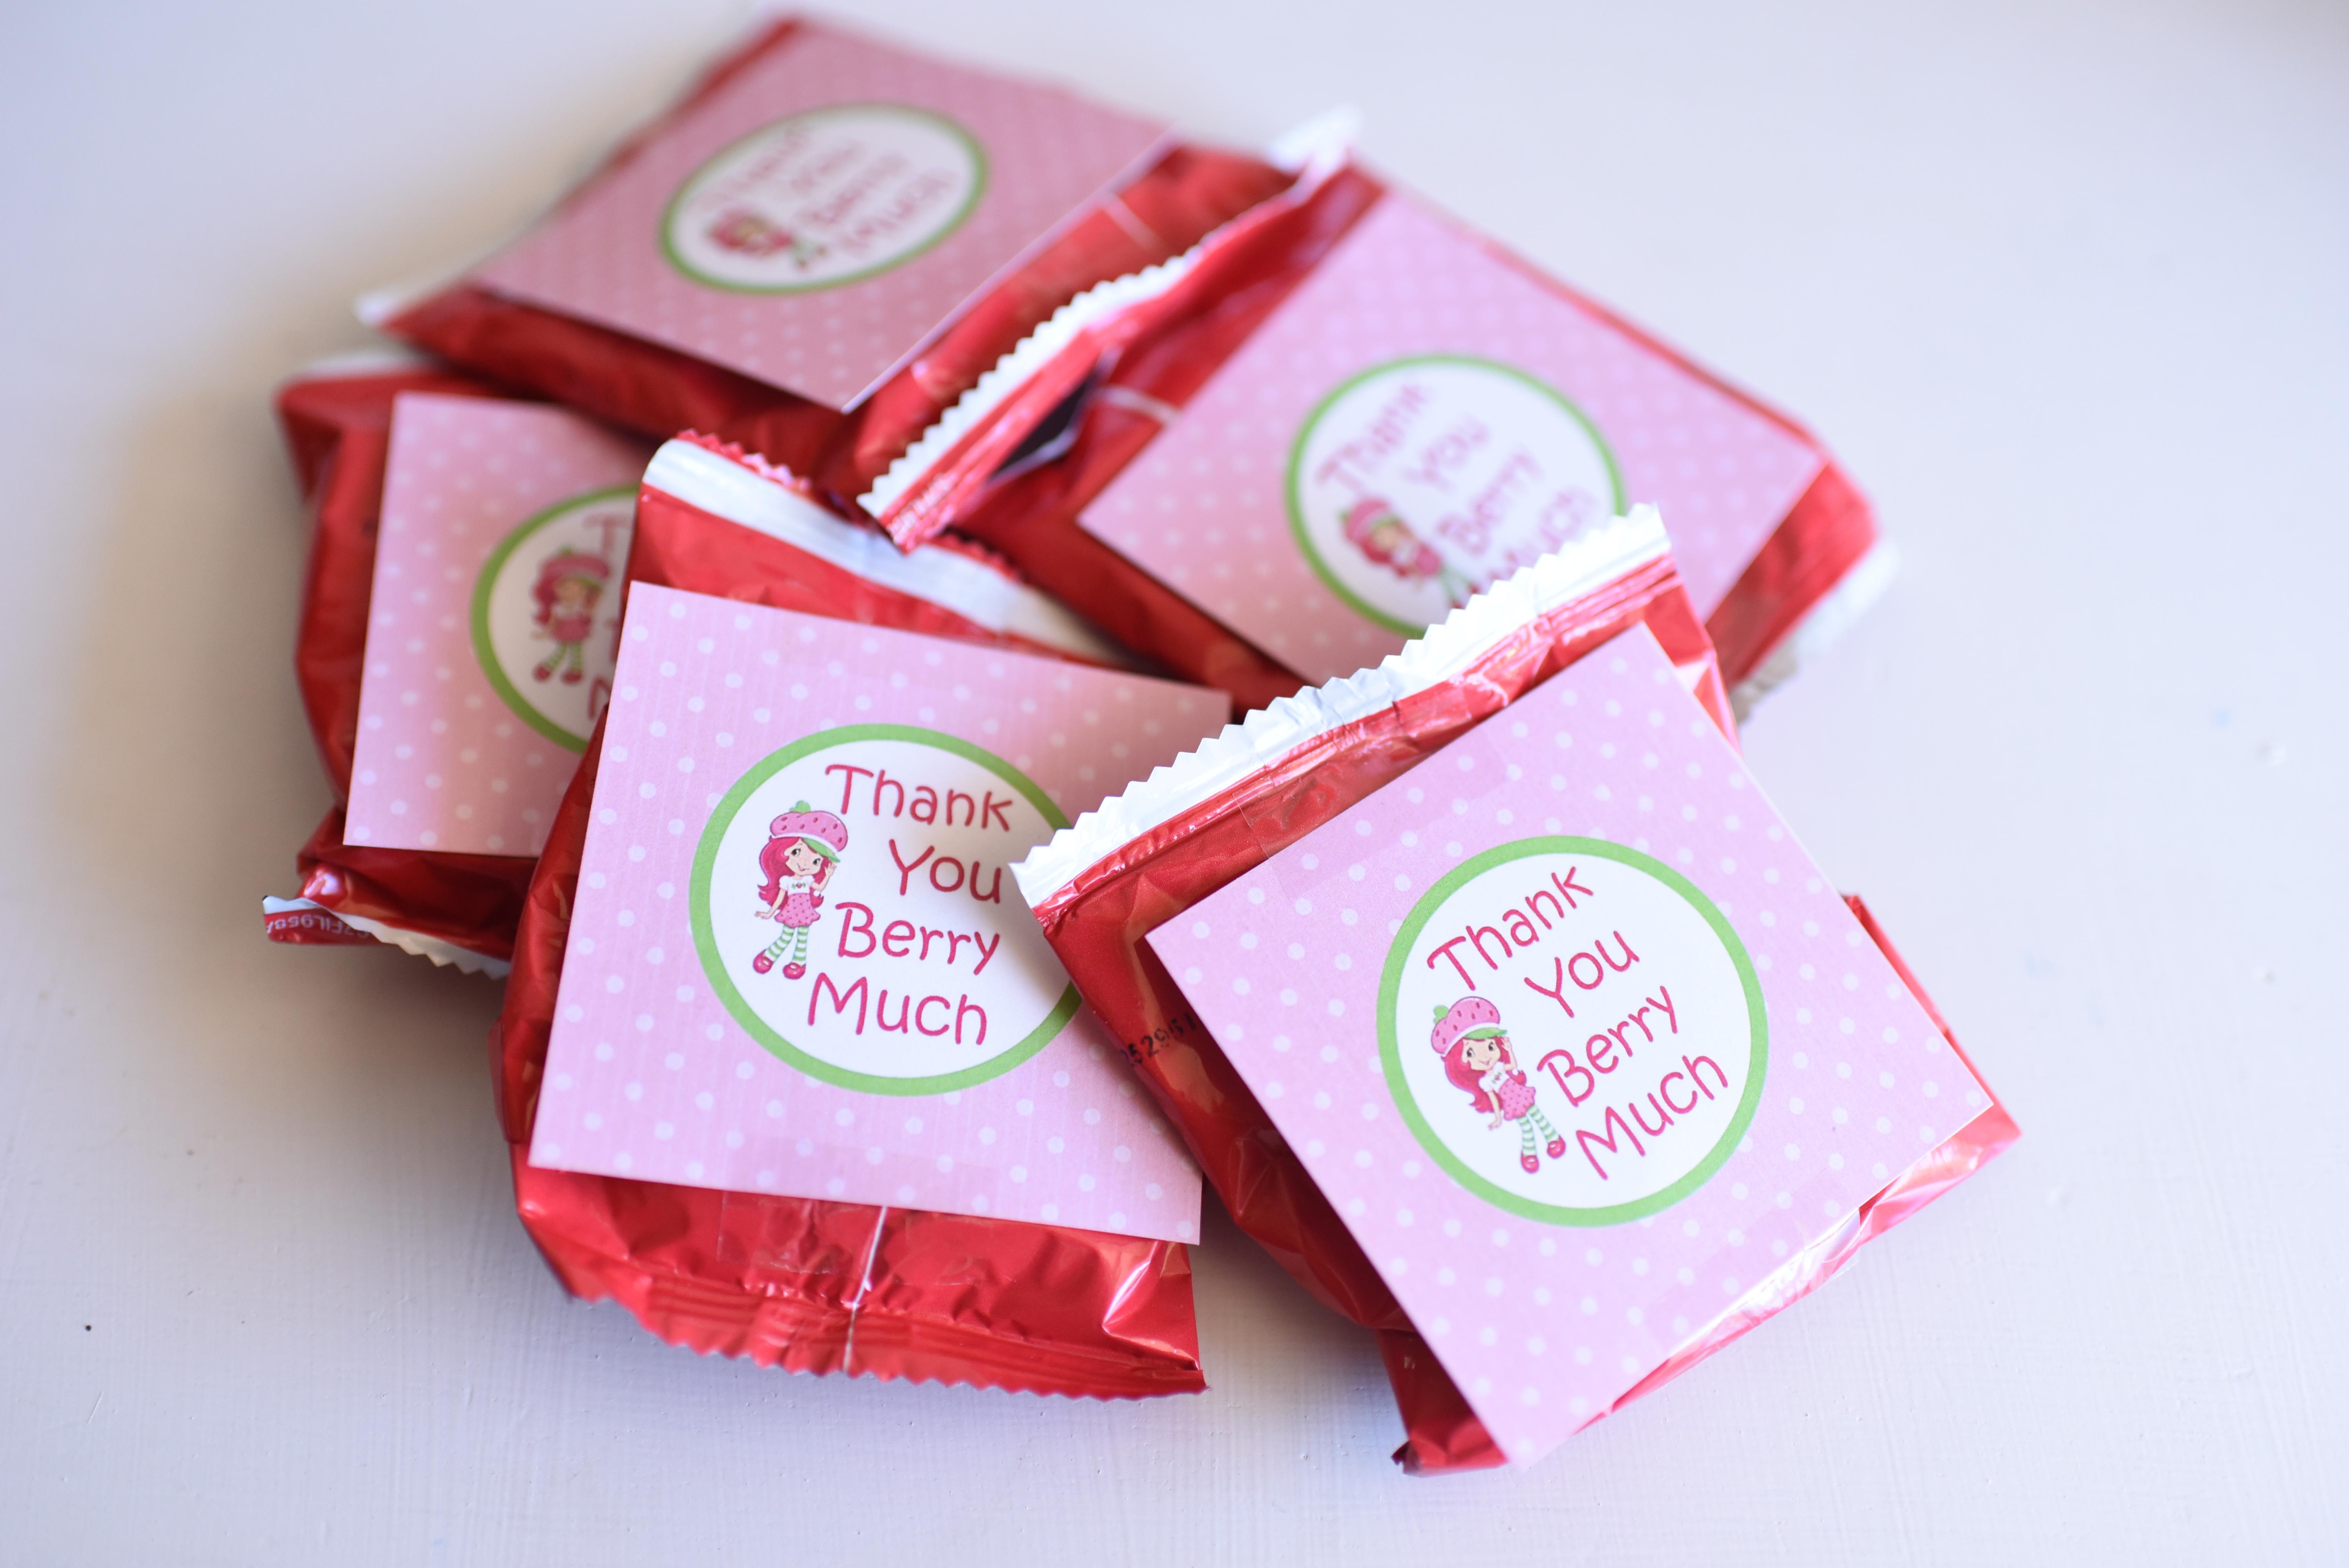 Strawberry Shortcake | I AM GLUTEN FREE